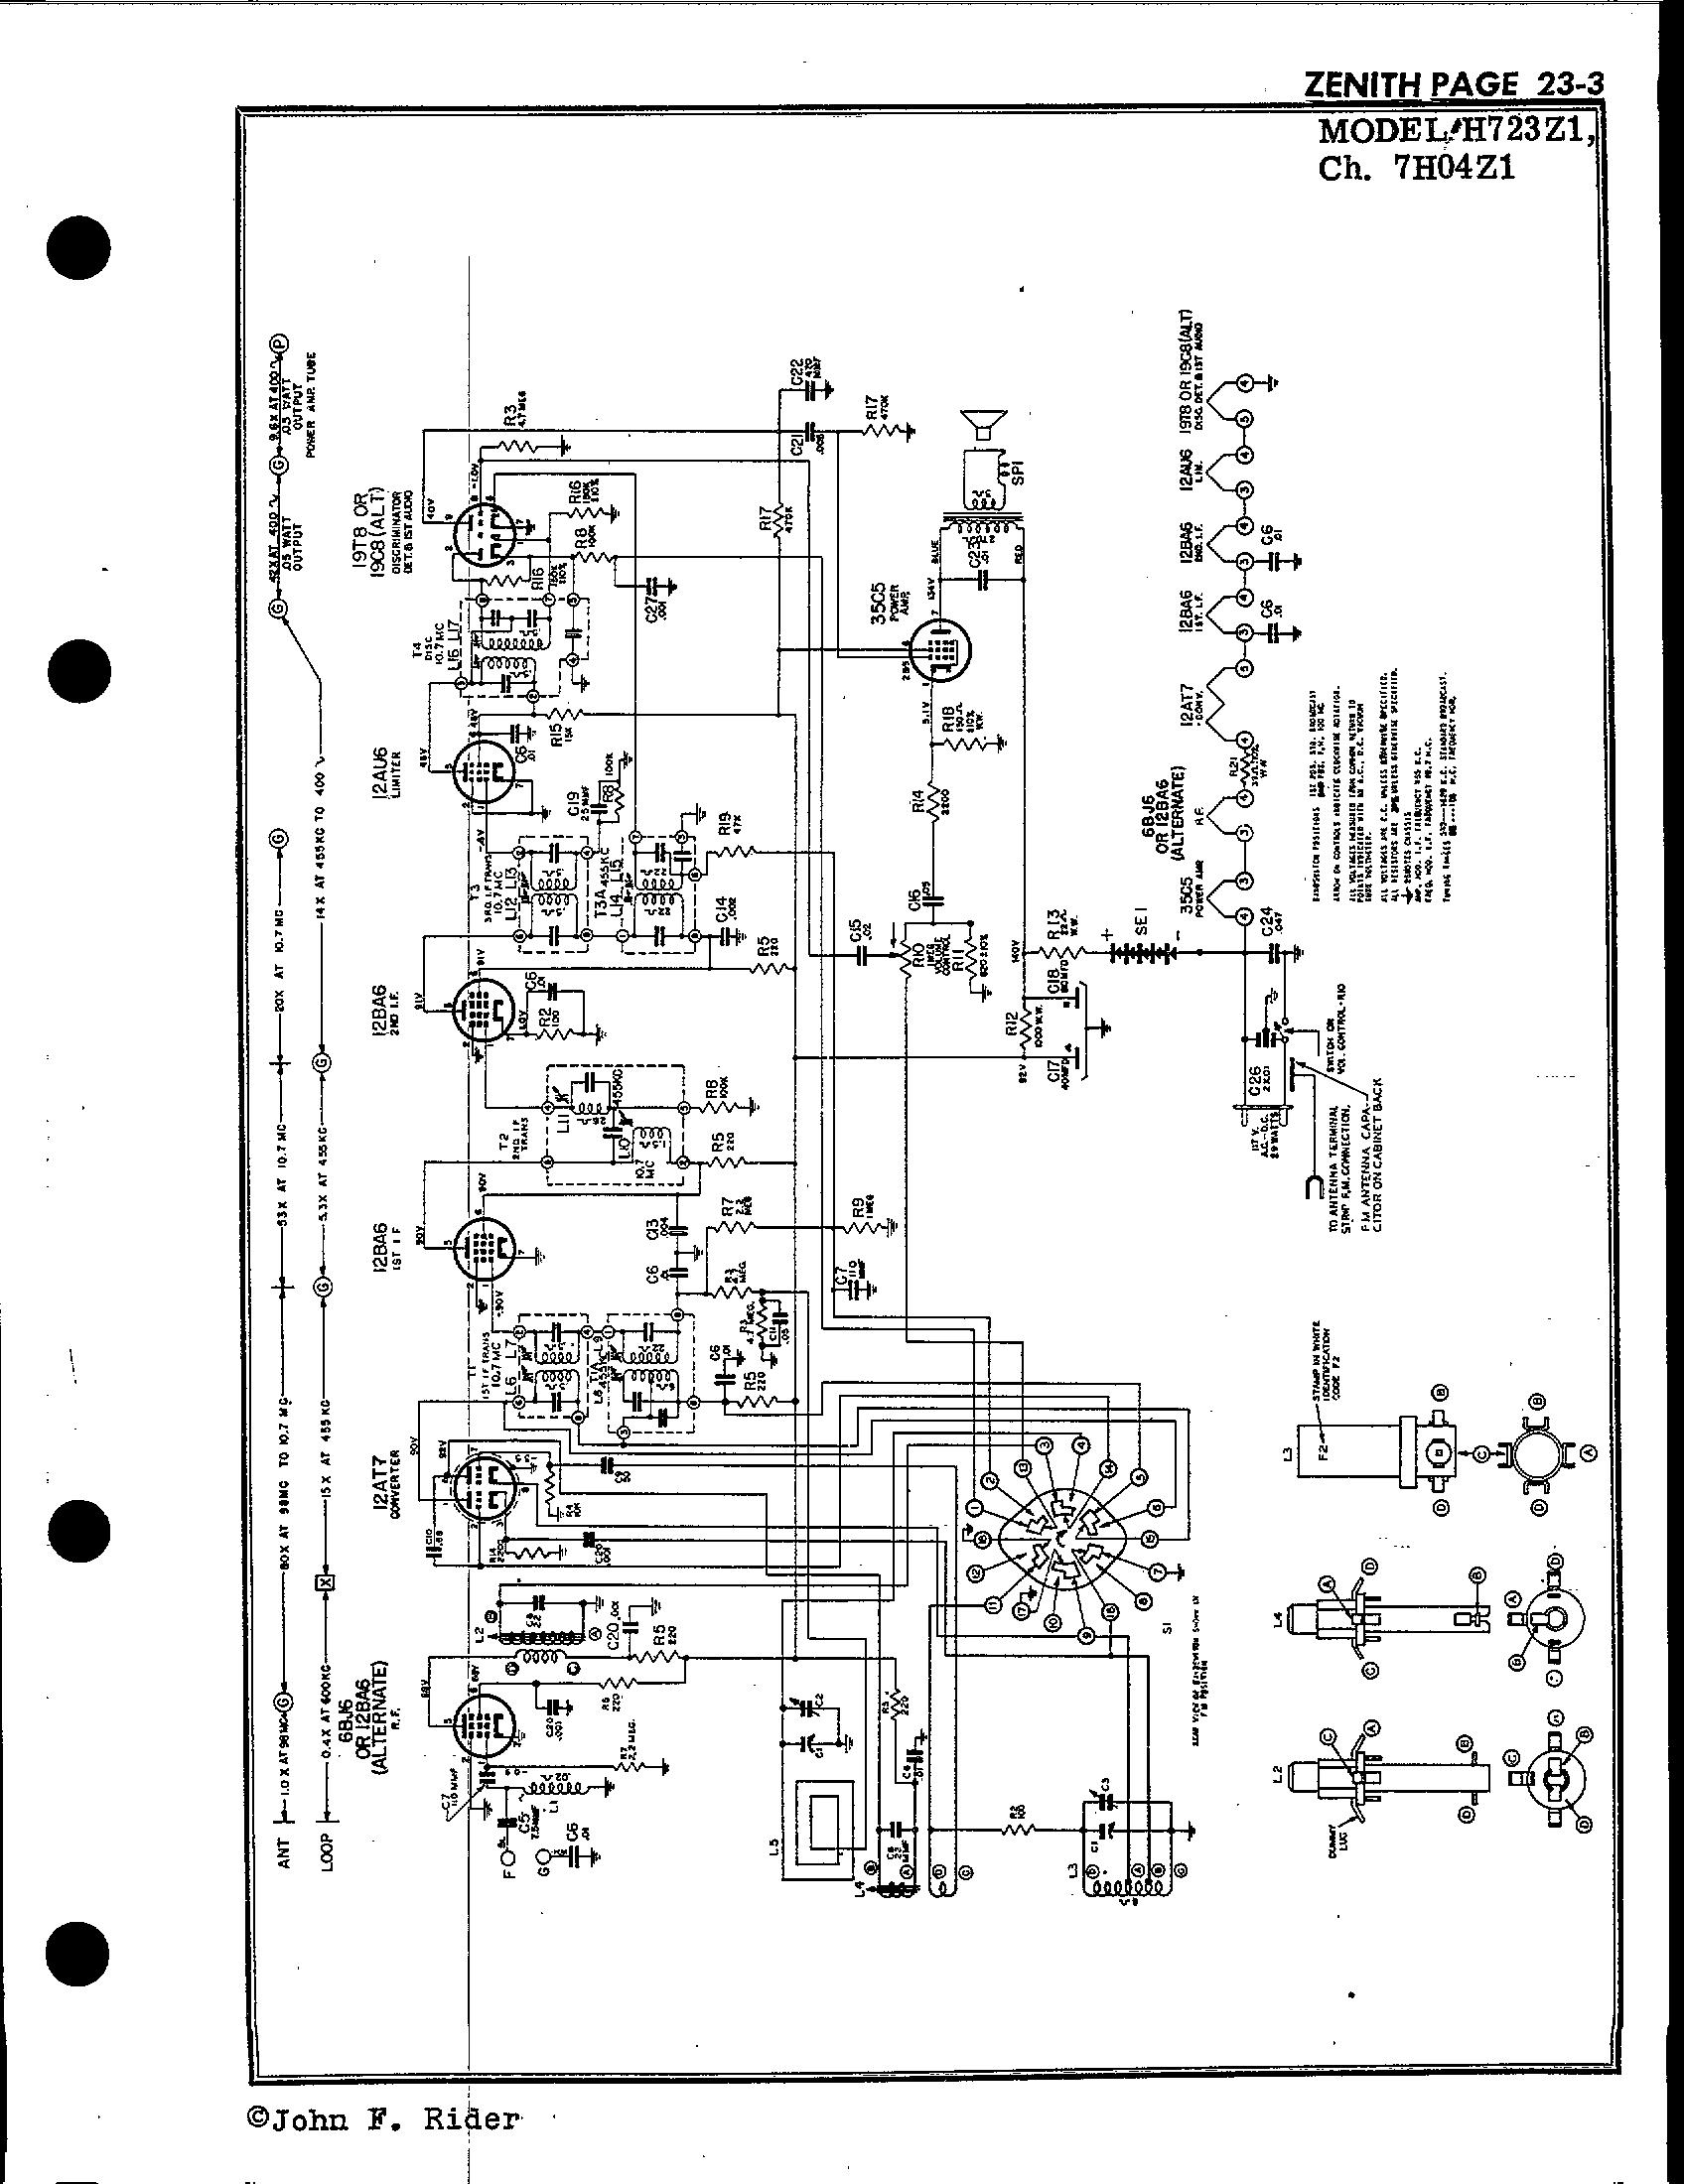 Zenith Radio Corp H723z1